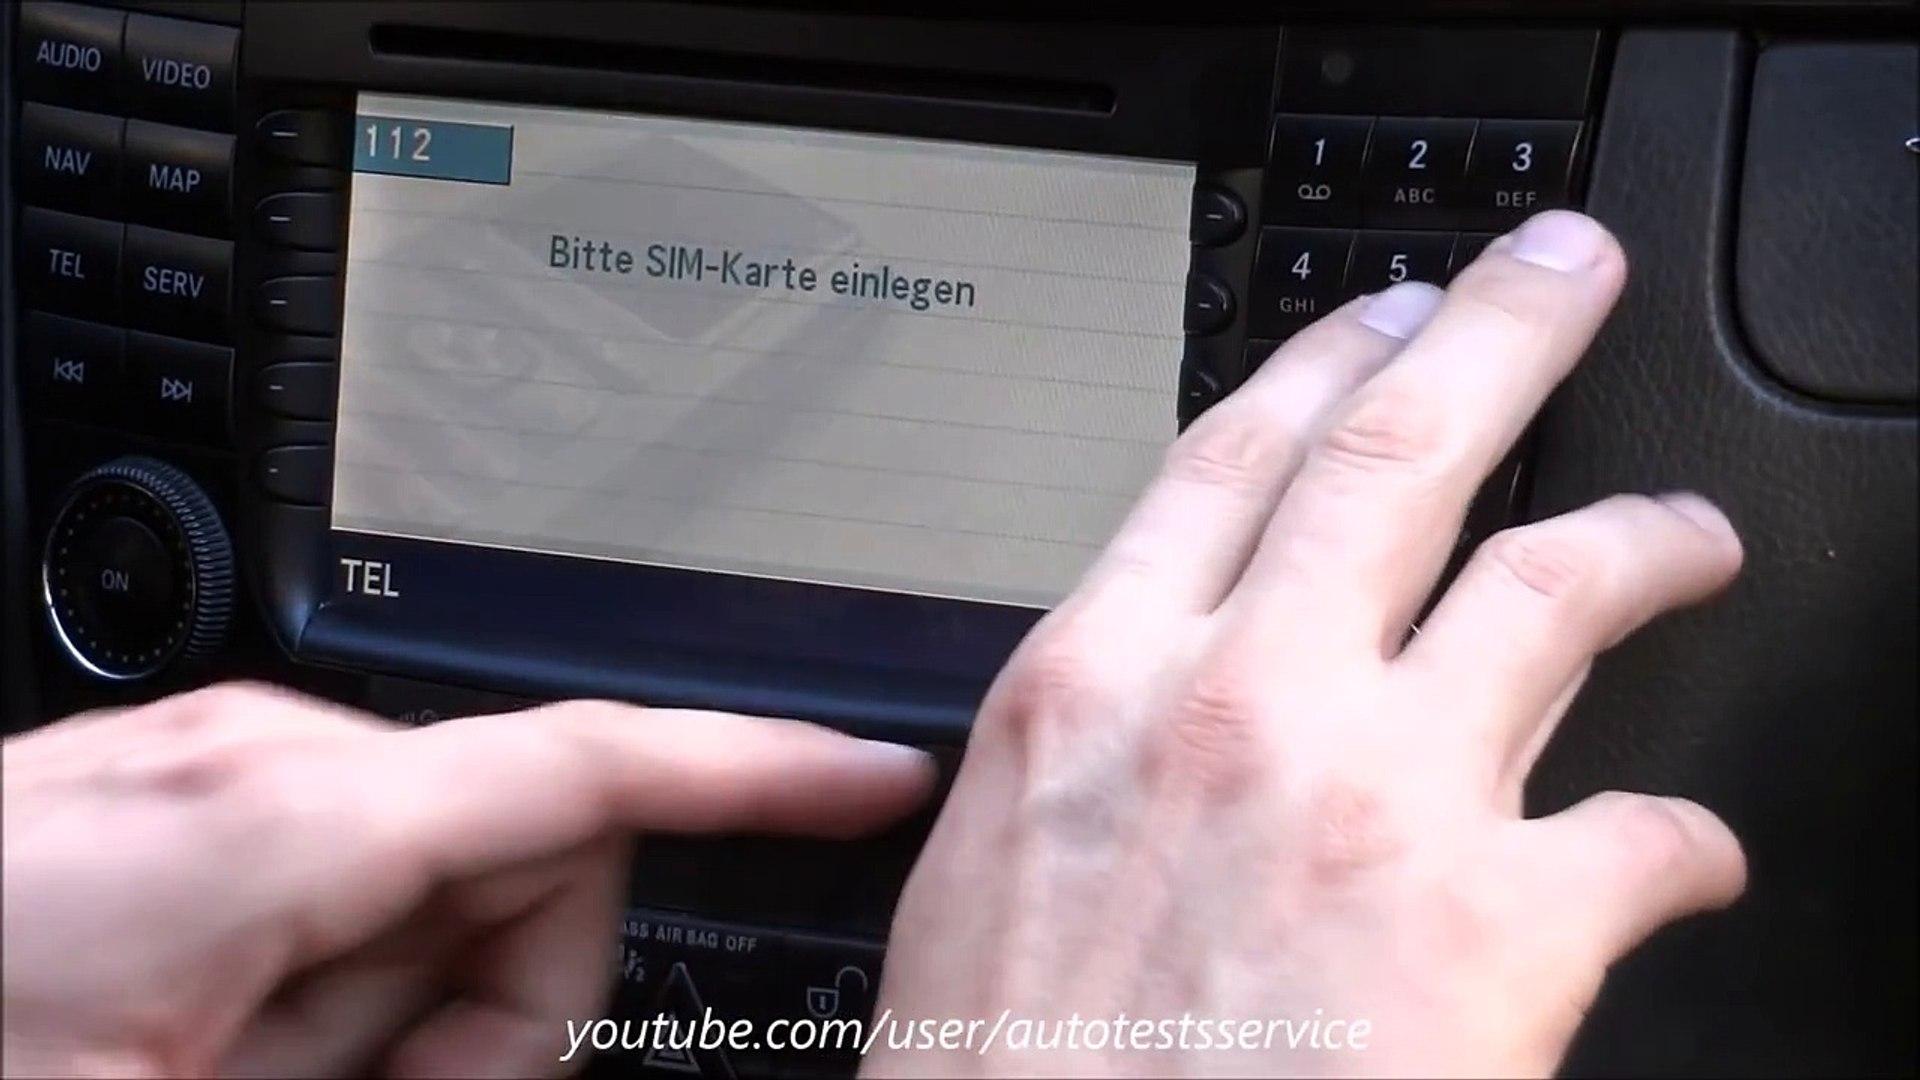 Mercedes W211 How to change COMAND logo to AMG (hidden menu)